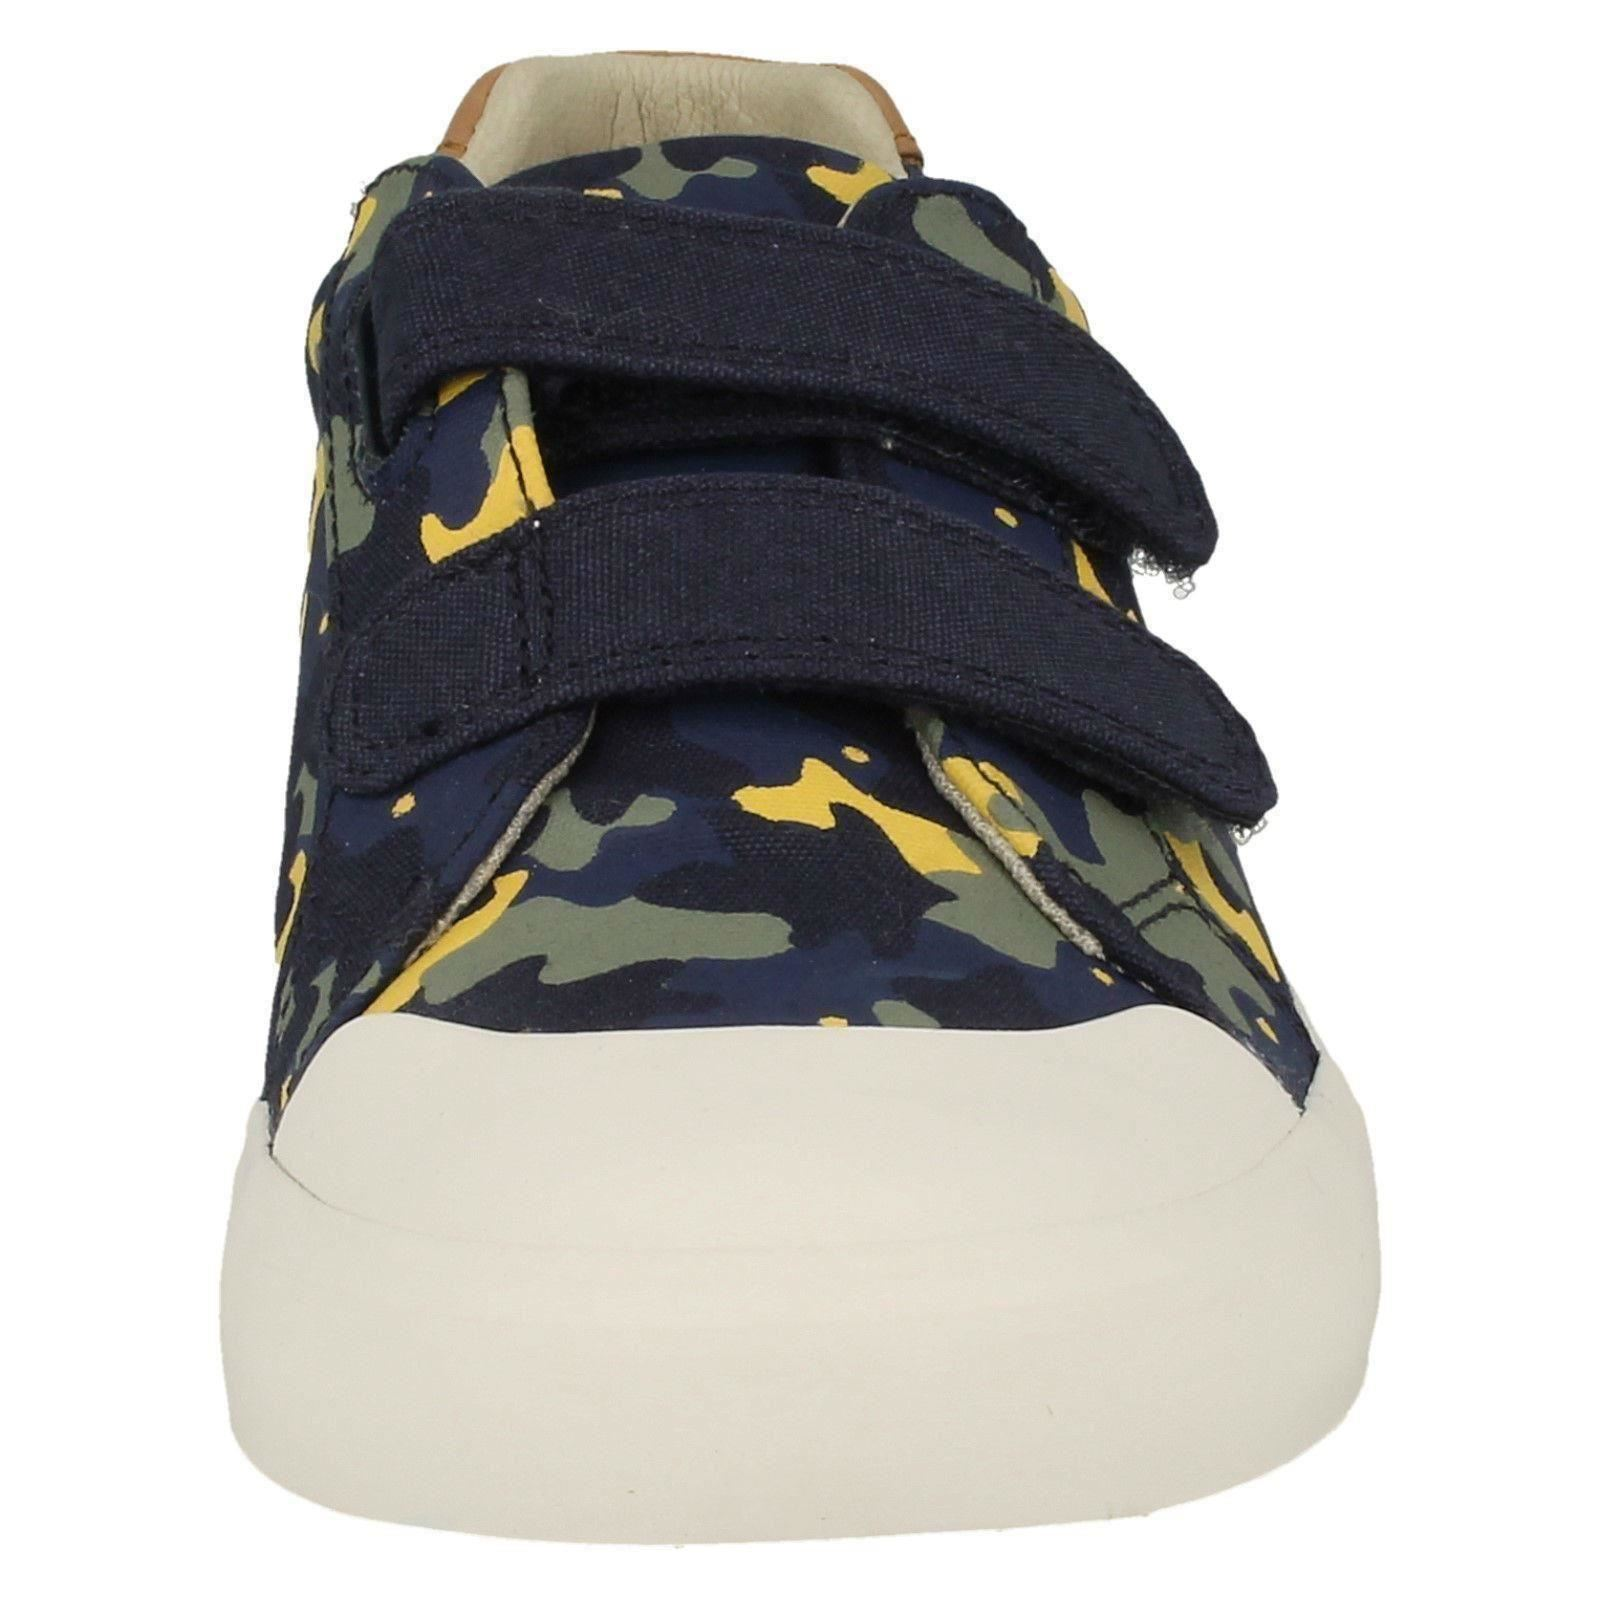 Boys Clarks Canvas Shoes *Comic Air*